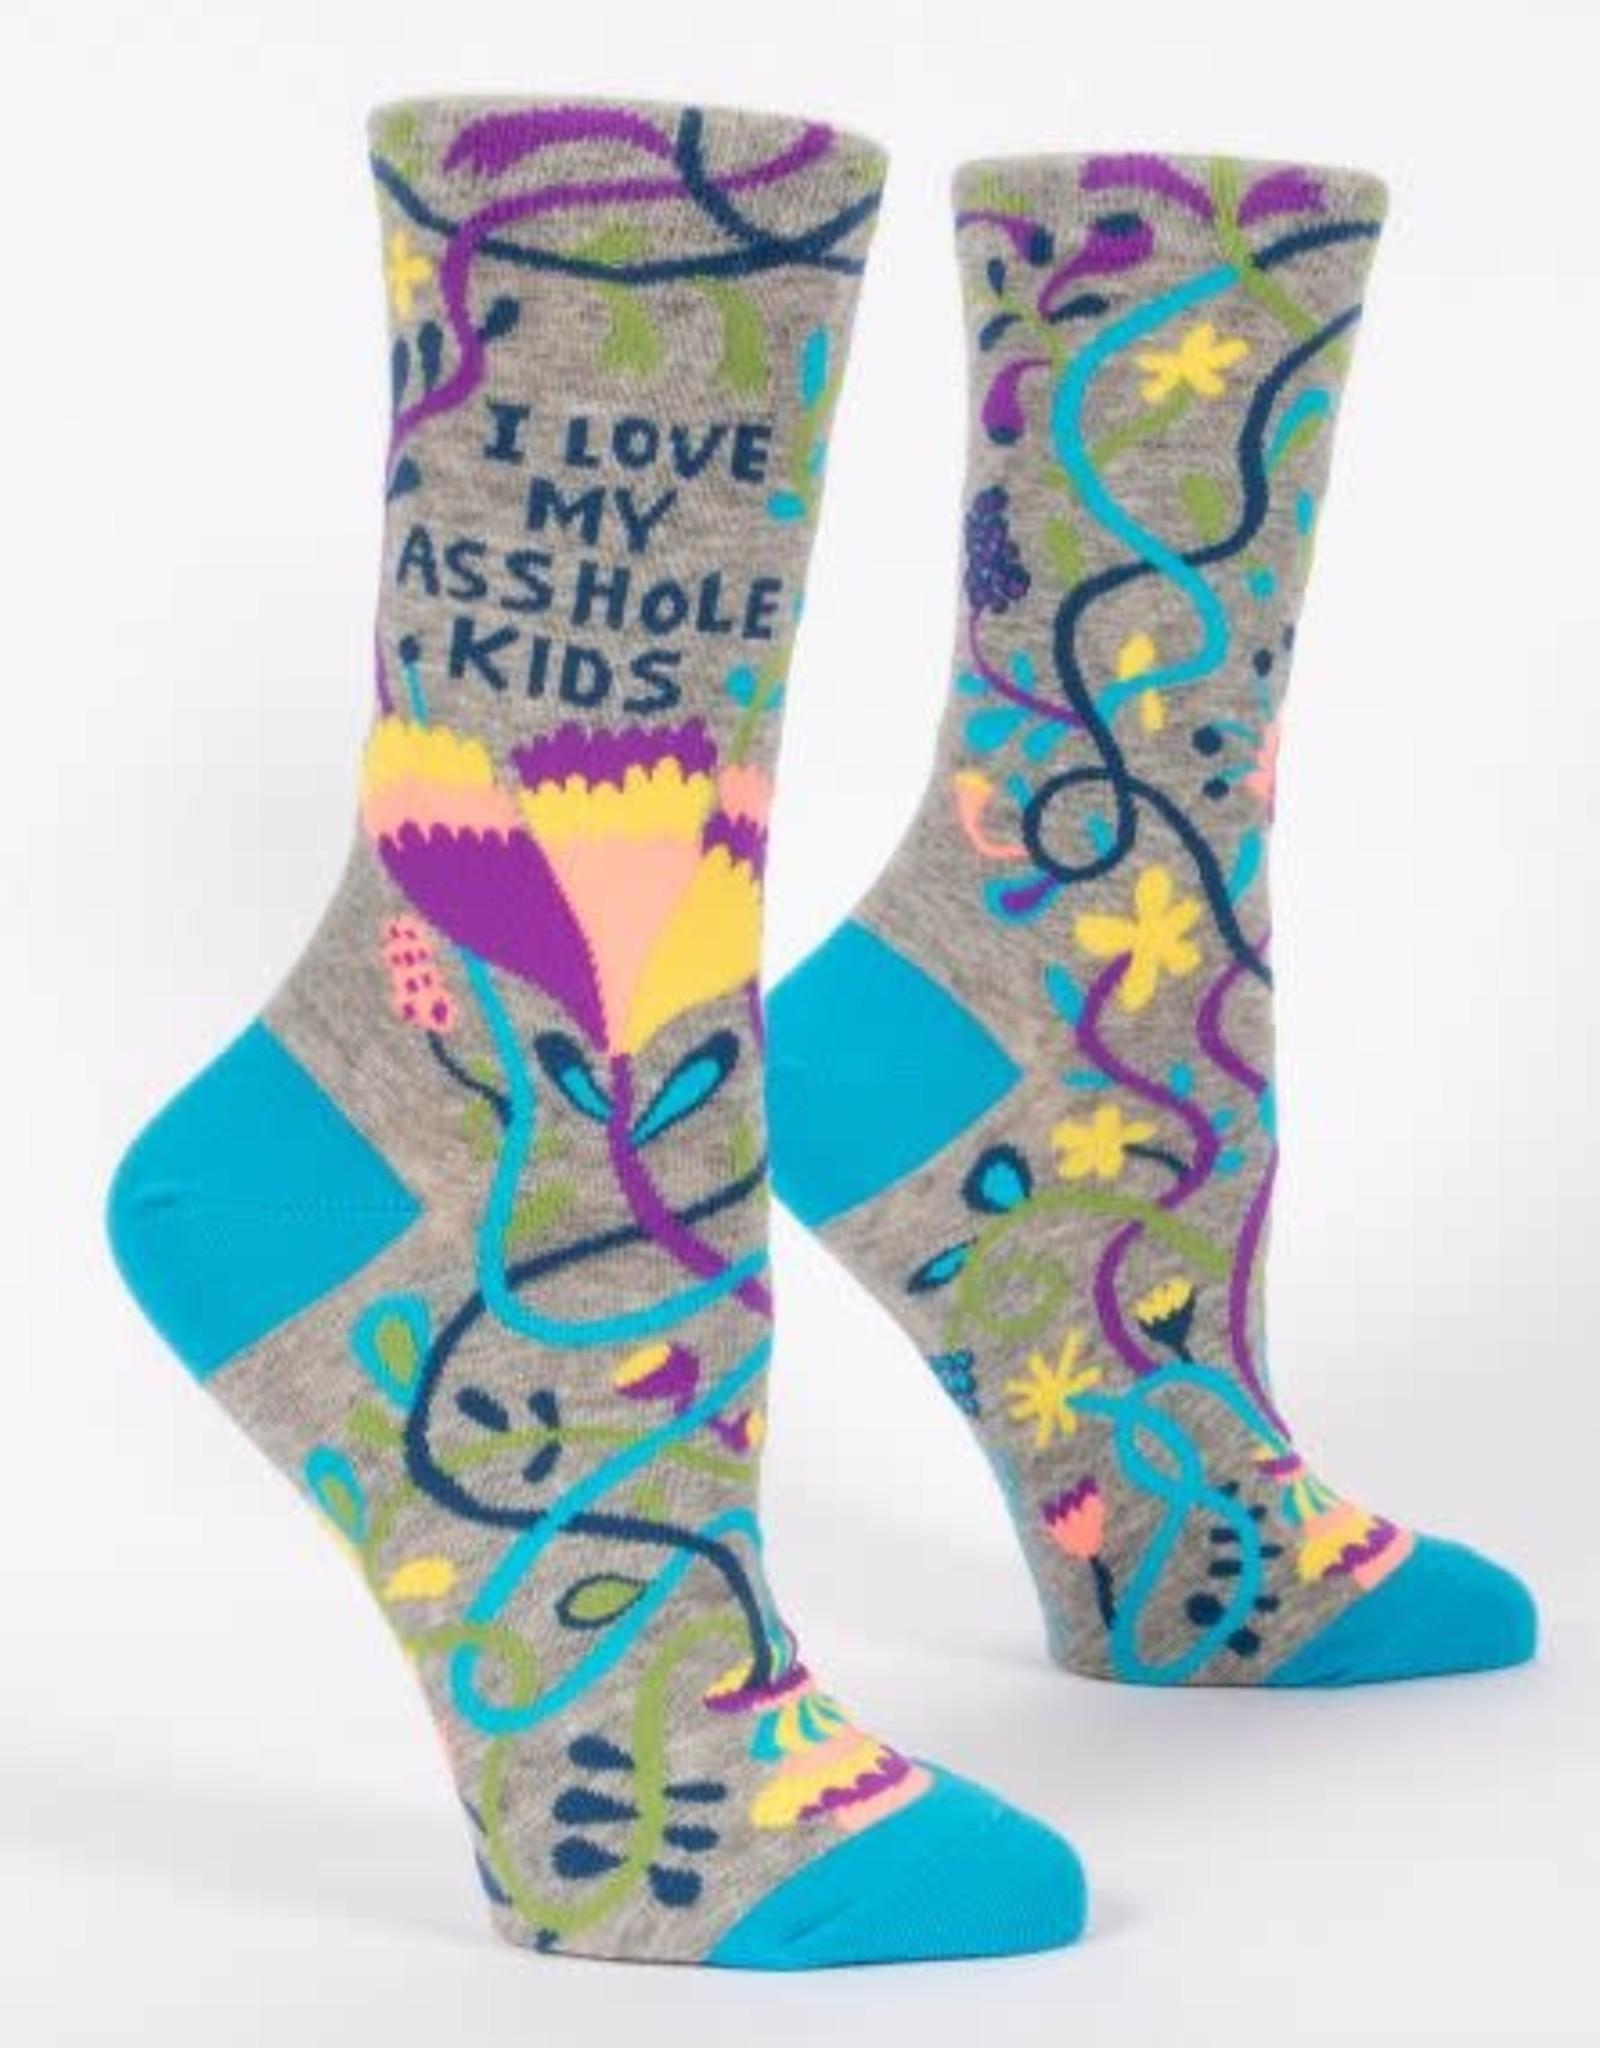 Blue Q Blue Q Women's Crew Socks Love My Asshole Kids